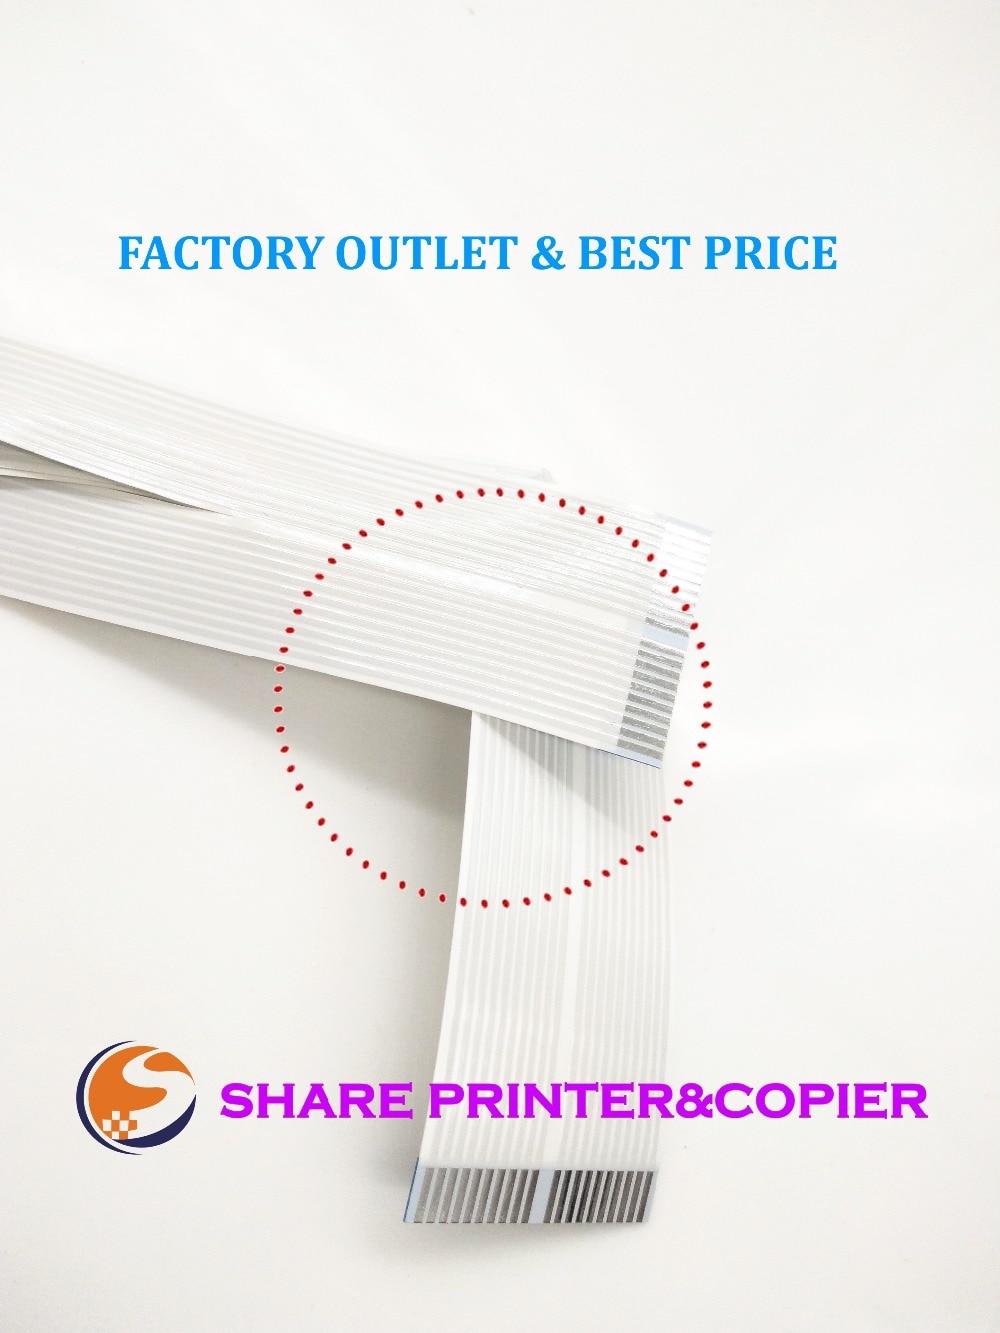 все цены на New printhead Cable L301 Cable for Epson L110 L111 L120 L130 L132 L210 L211 L220 L222 L300 L301 L303 L310 L350 L351 L353 онлайн